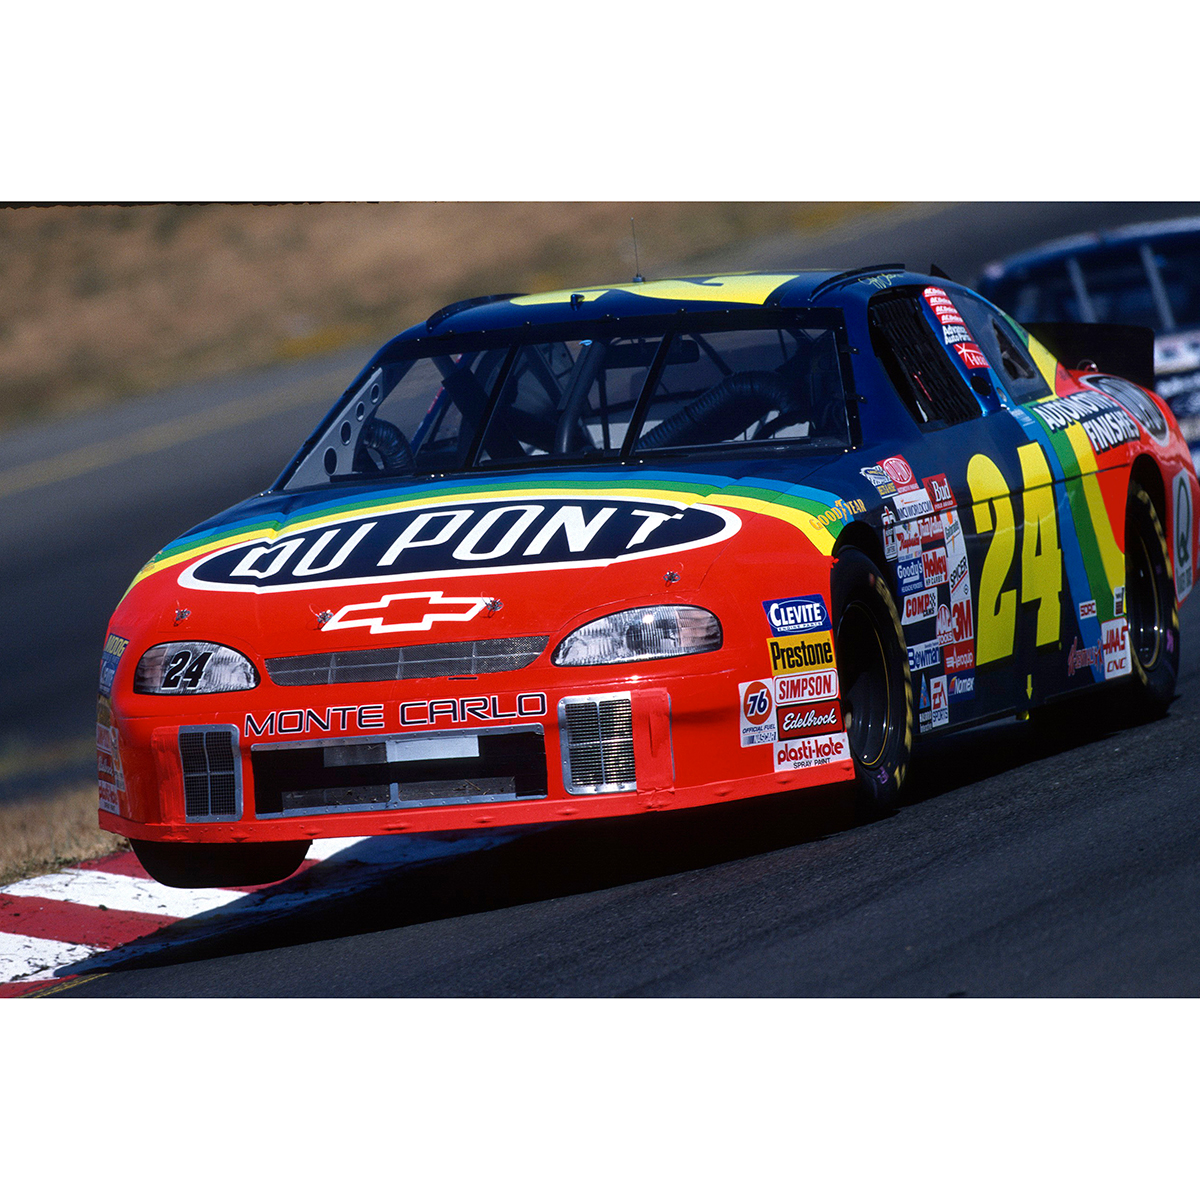 Dual Autographed Jeff Gordon / Ray Evernham 1999 #24 Sonoma Race Win 1:24 Scale Die Cast